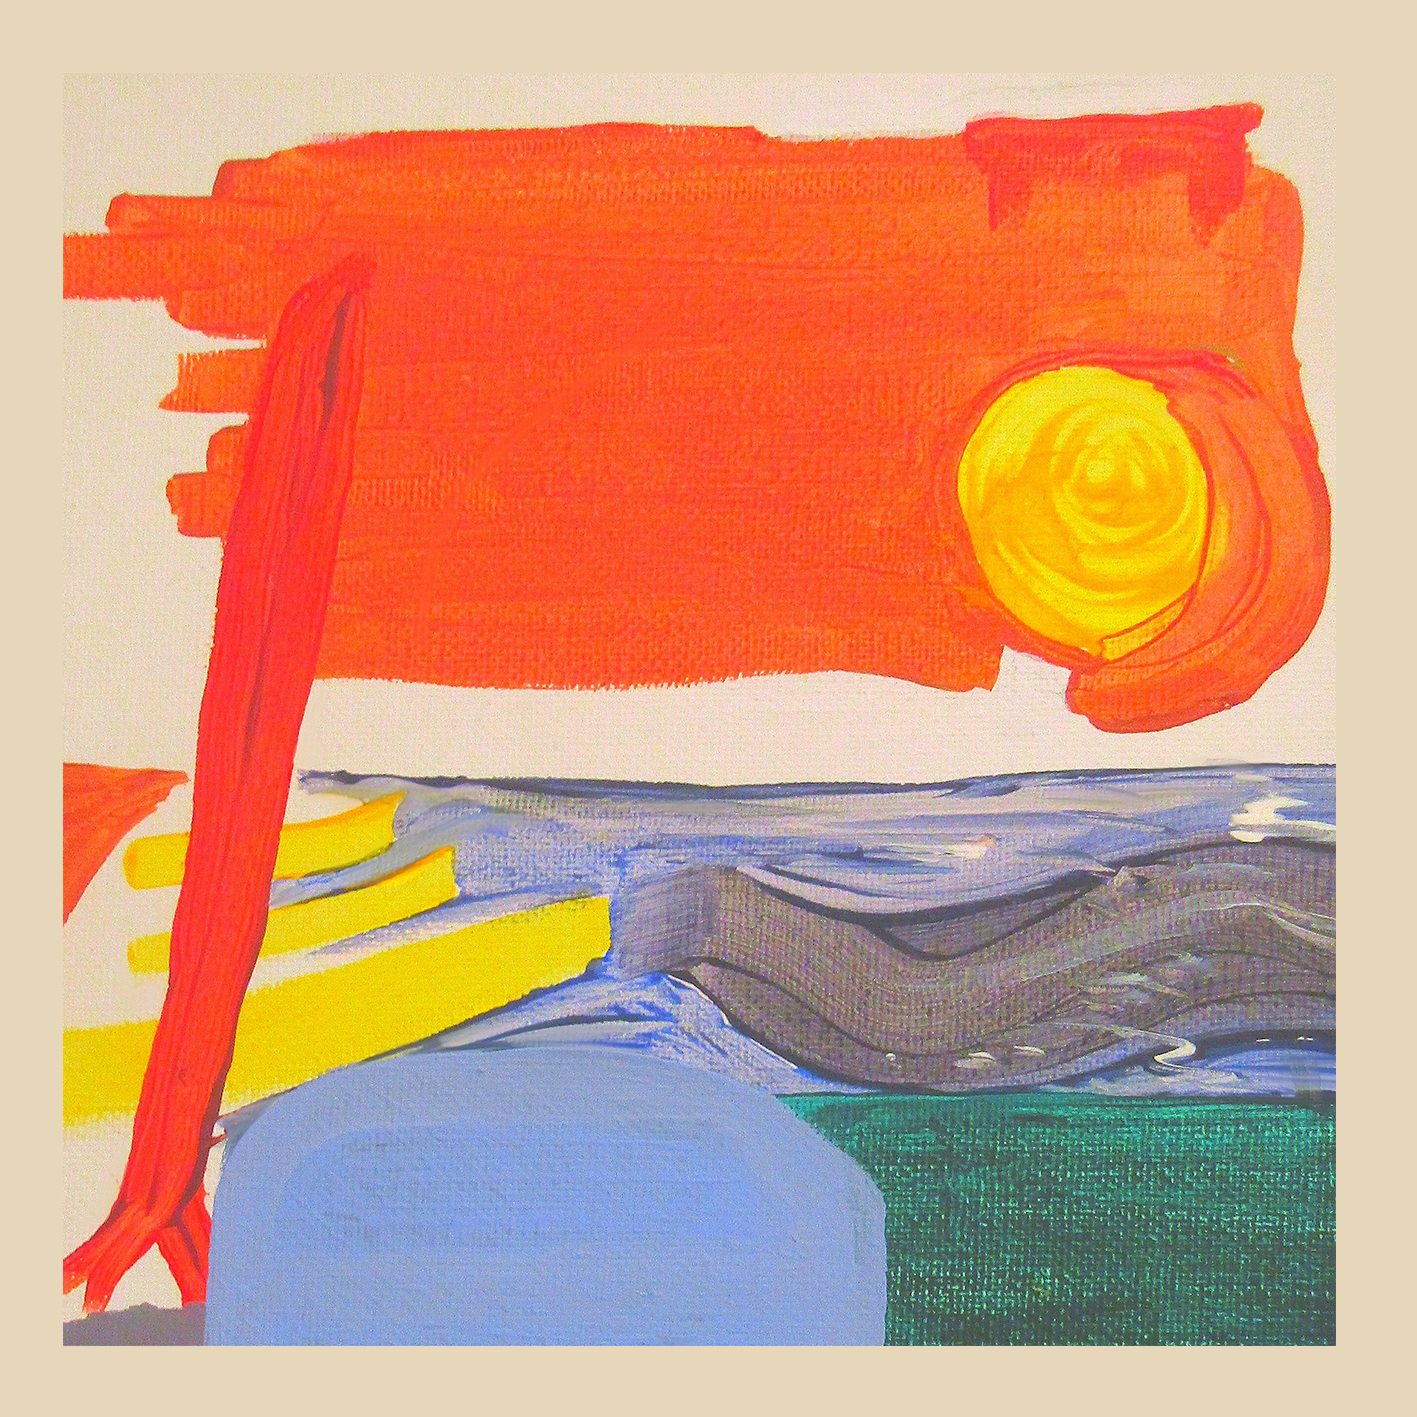 MurmurationAlbumCover - Painting by Niall Jackson